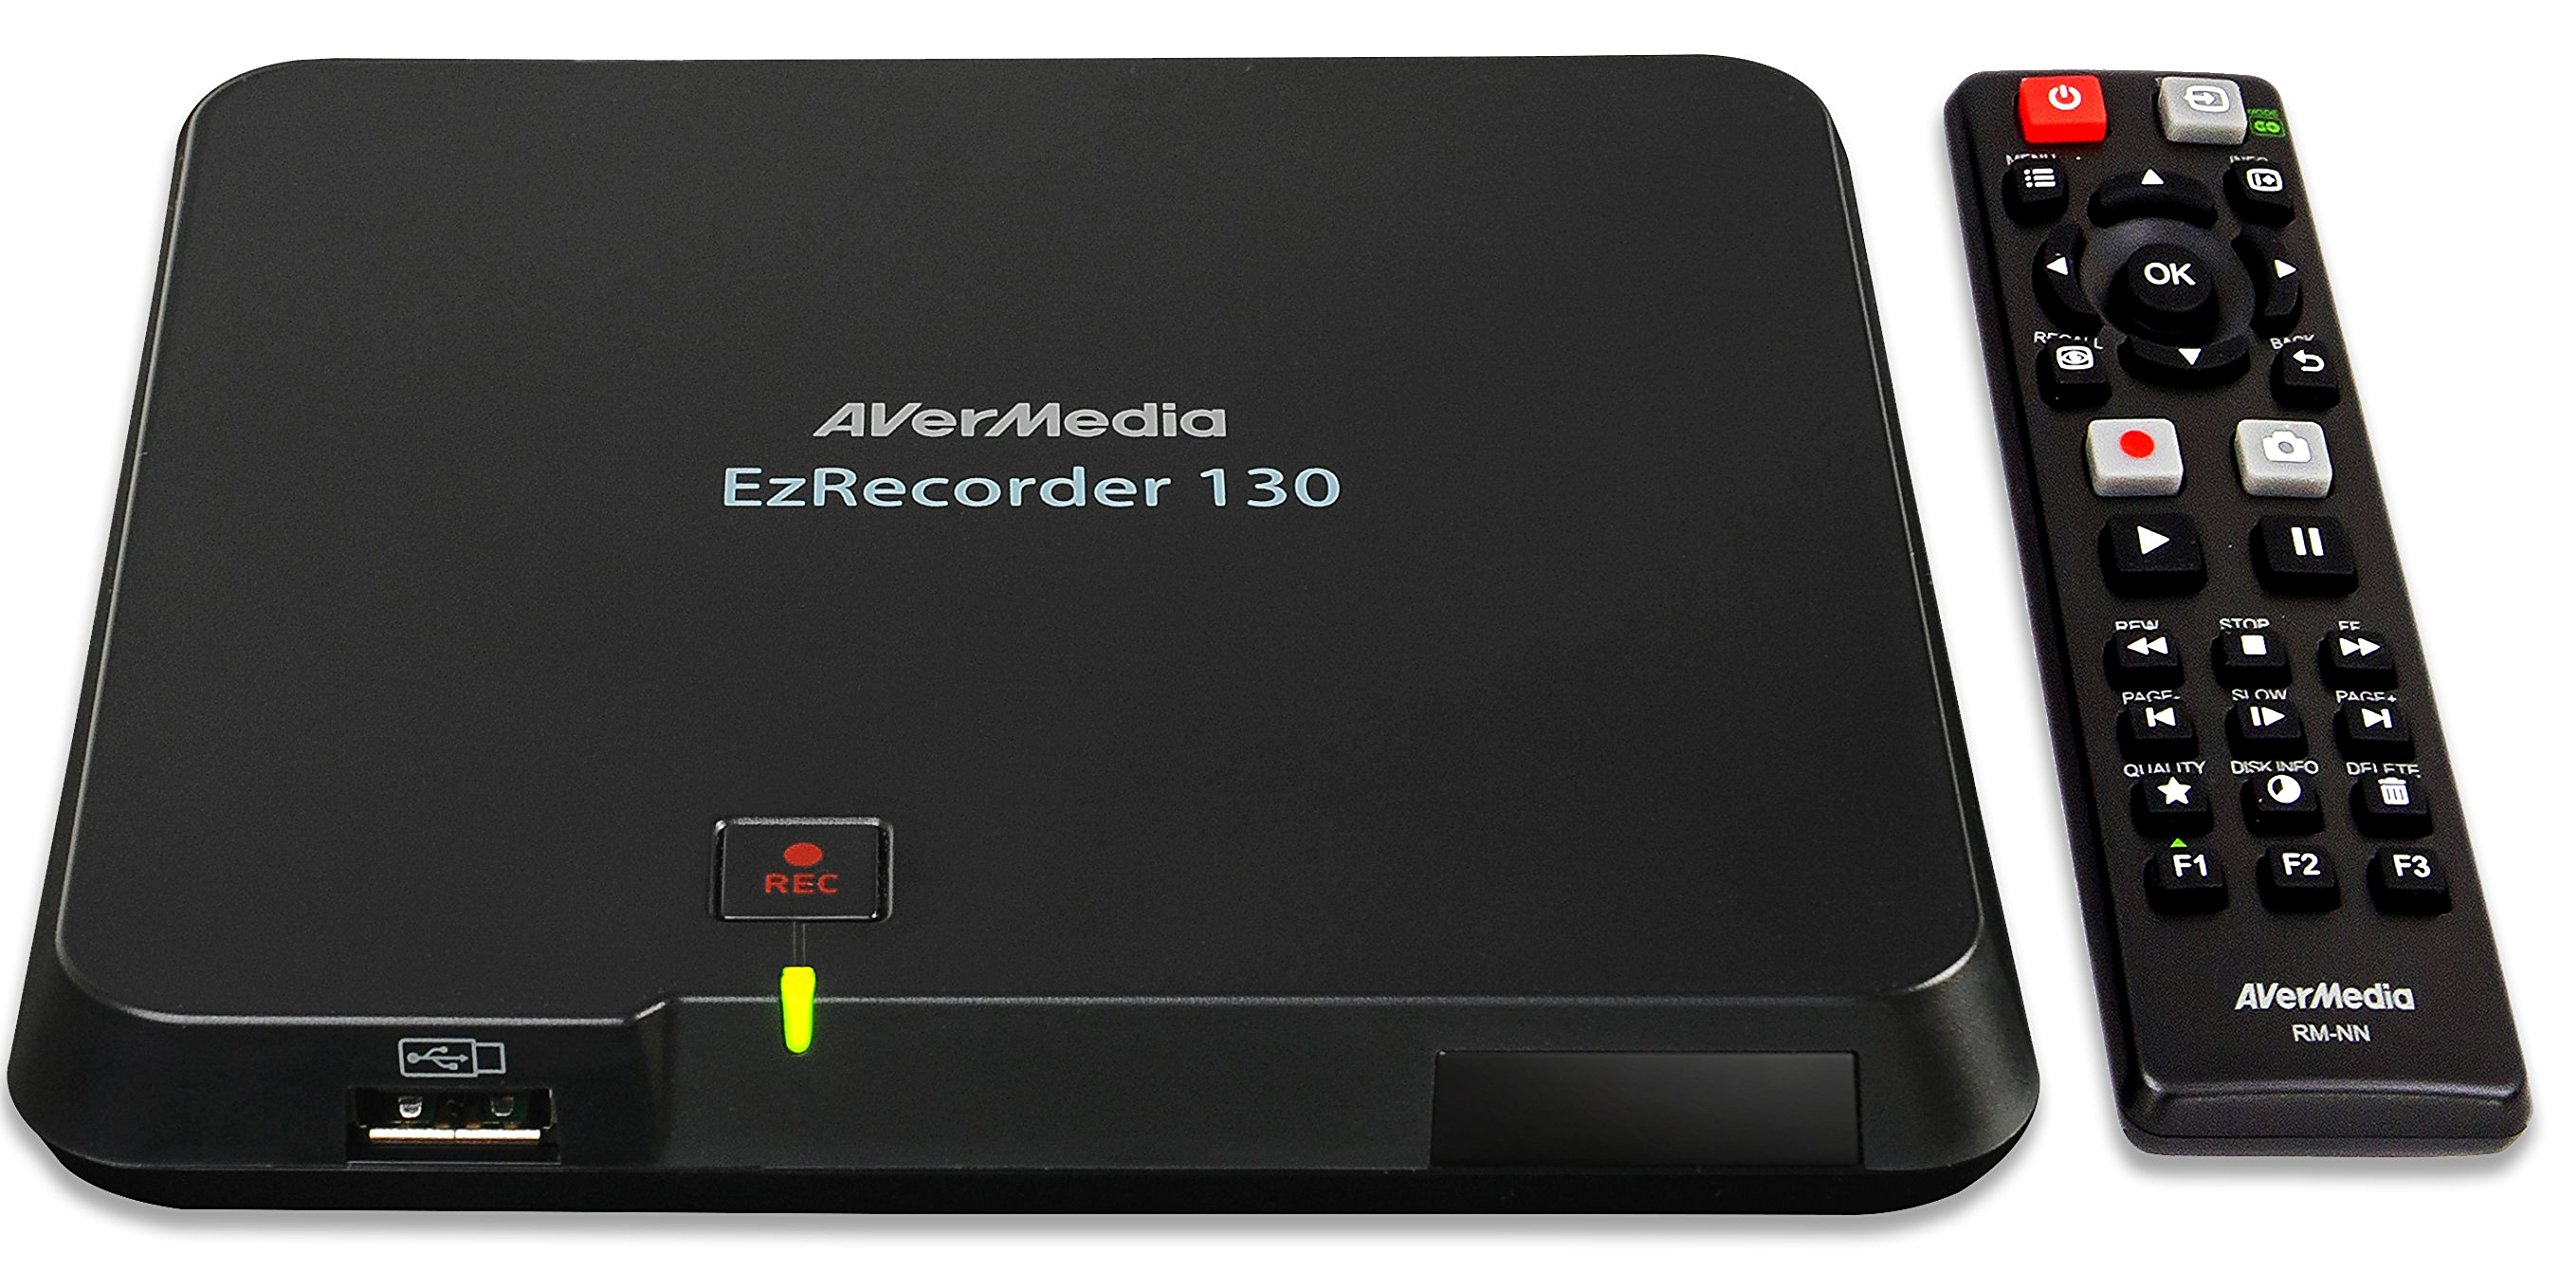 AVerMedia EzRecorder, HD Video Capture High Definition HDMI Recorder, PVR, DVR, Schedule Recording (ER130)